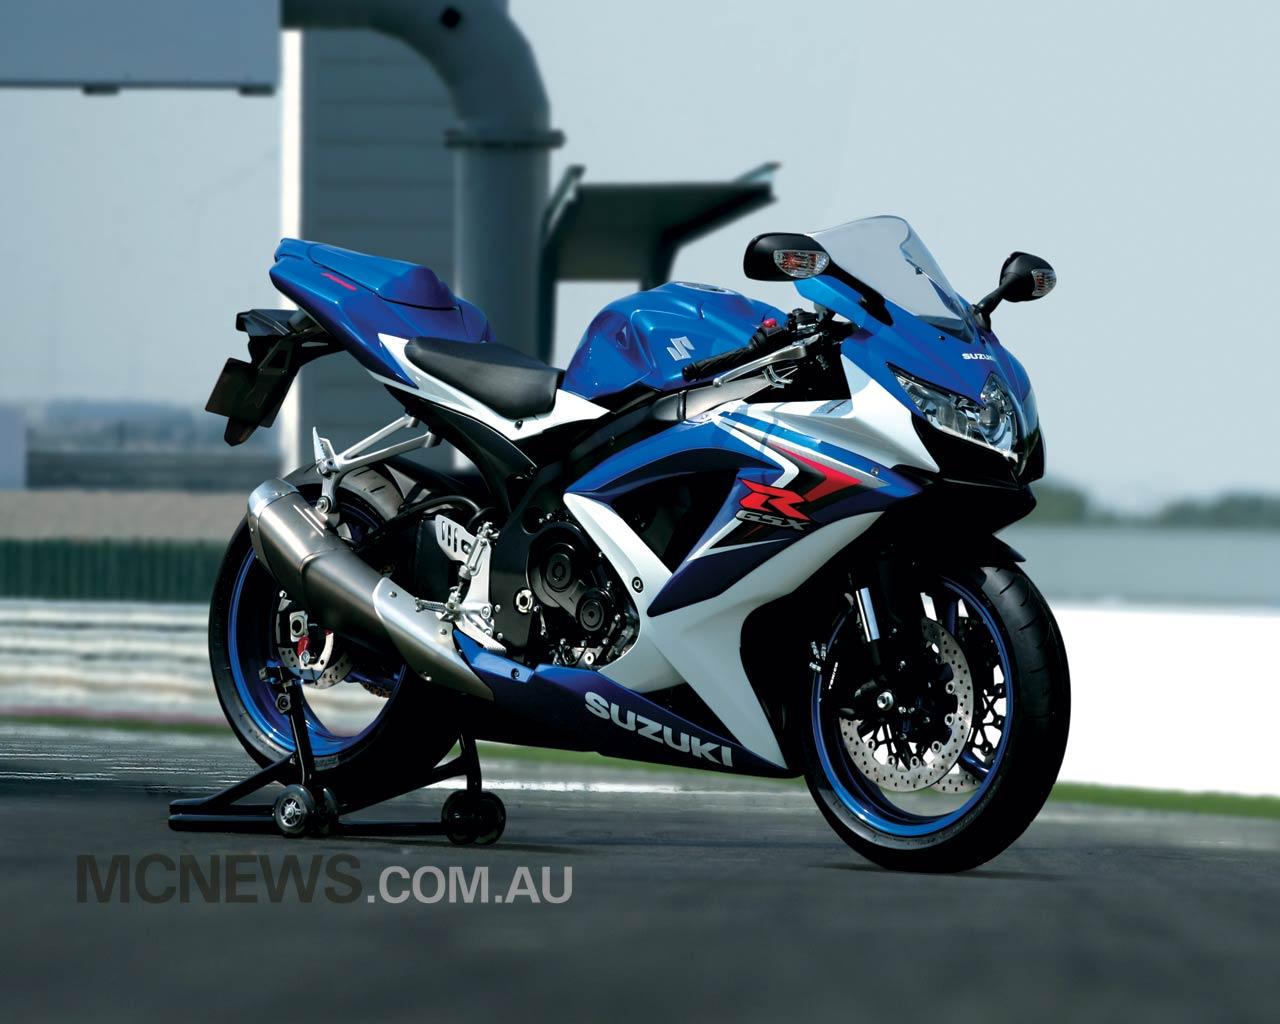 Suzuki Gsxr 750 Wallpaper 7651 Hd Wallpapers in Bikes   Imagescicom 1280x1024